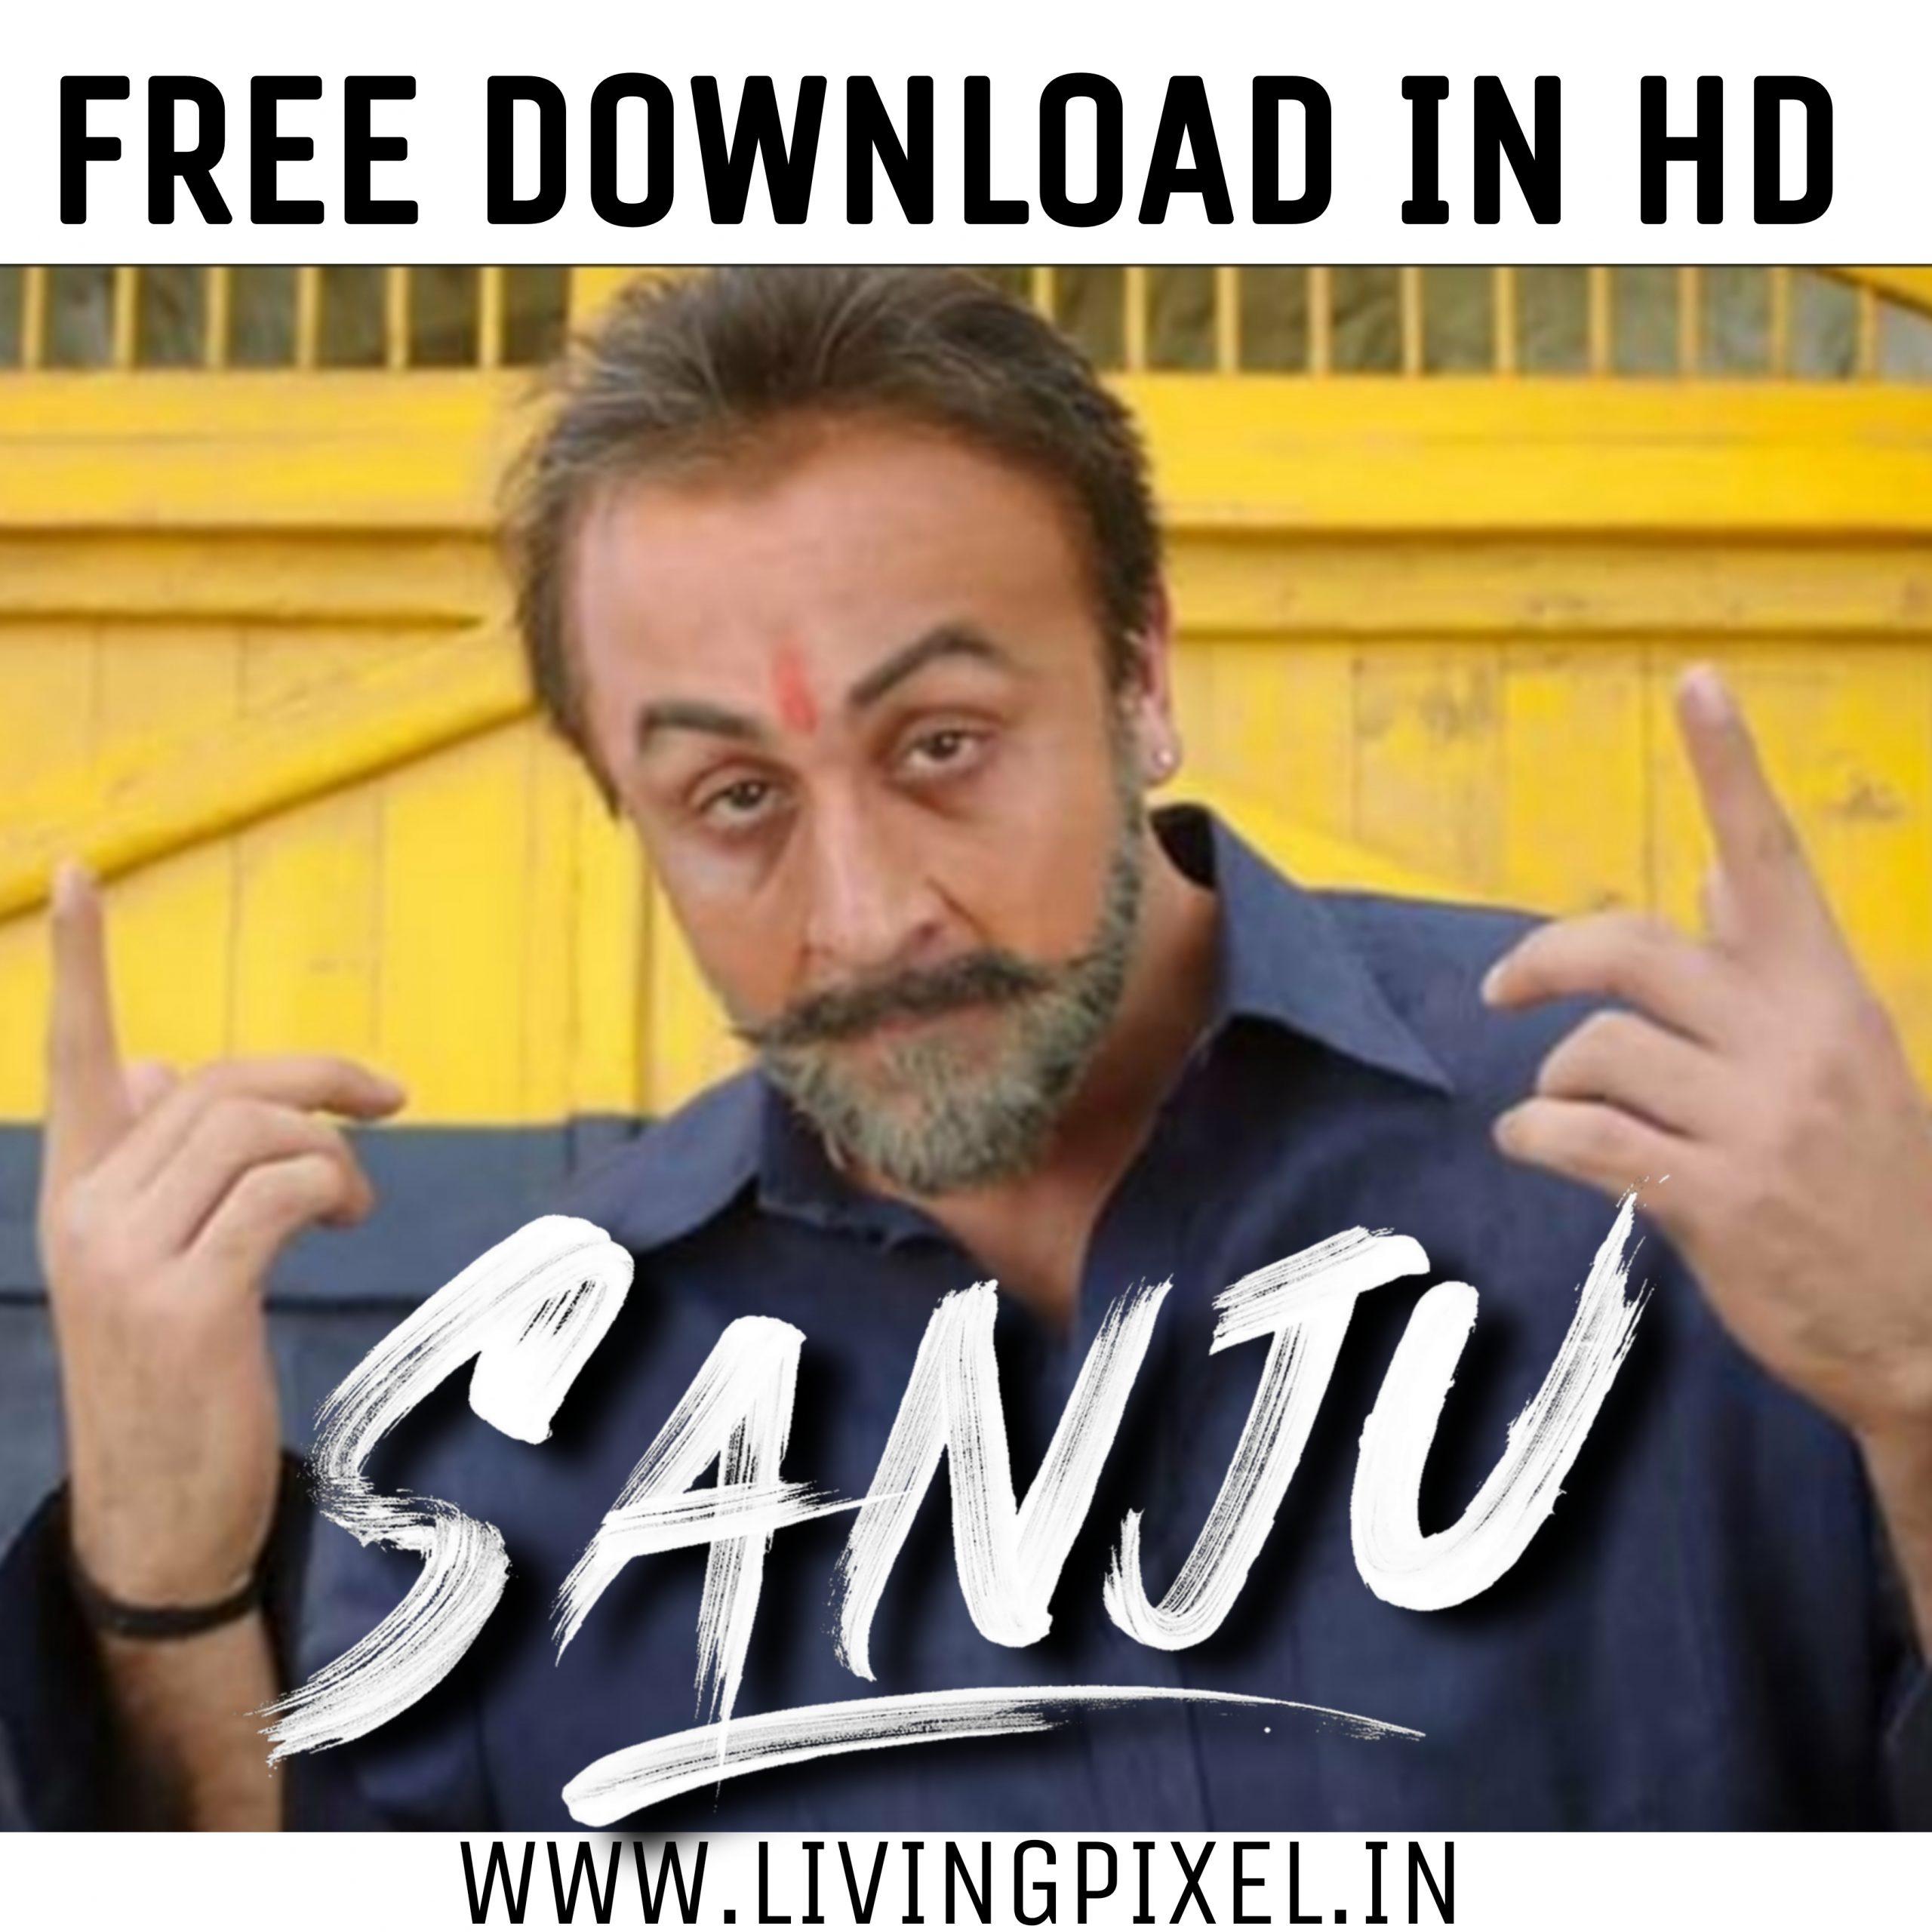 Sanju movie download Telegram in HD